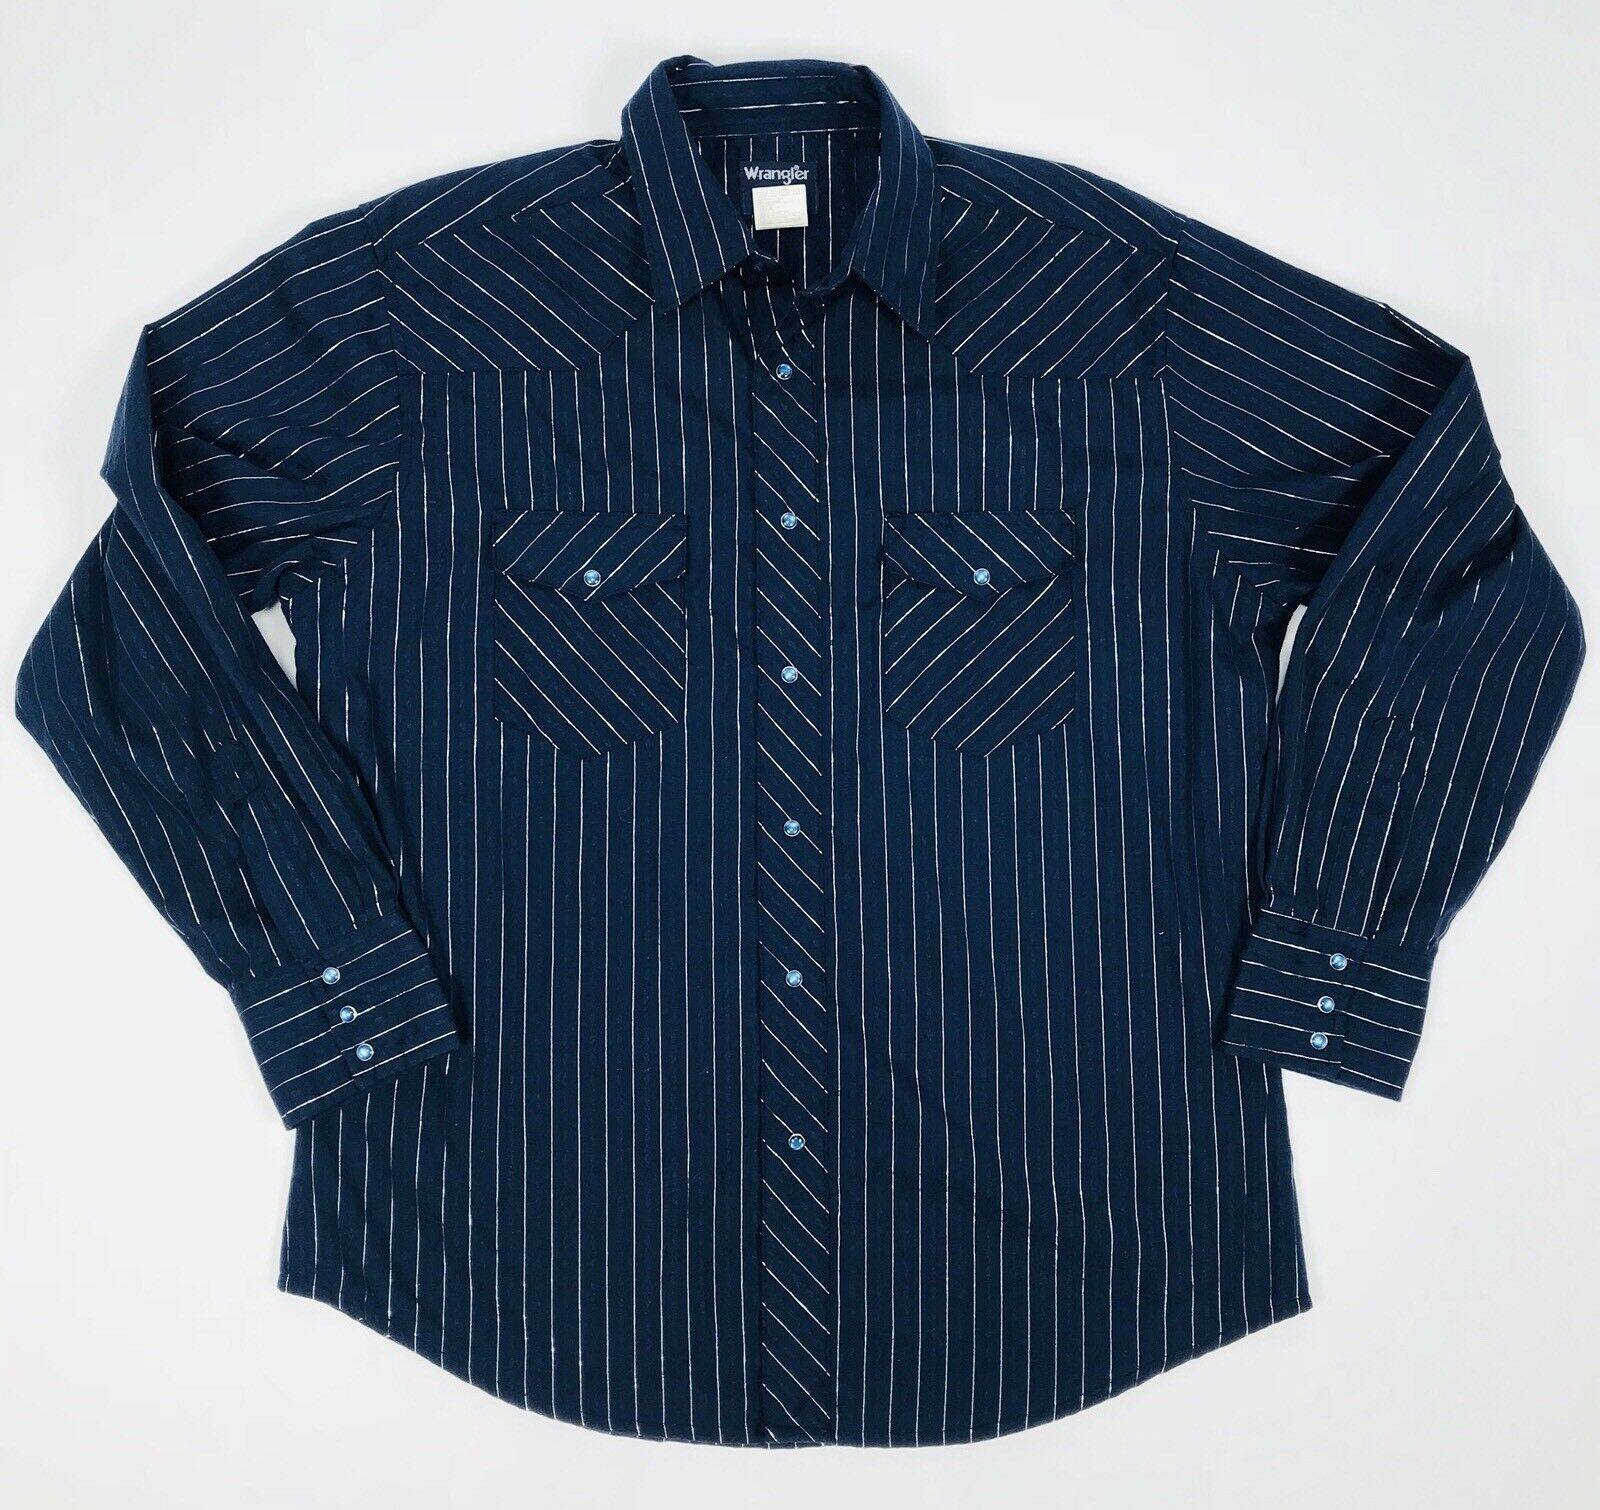 VTG WRANGLER Rodeo Western Shirt Cowboy Pearl Snap Navy bluee Metallic Stripes L